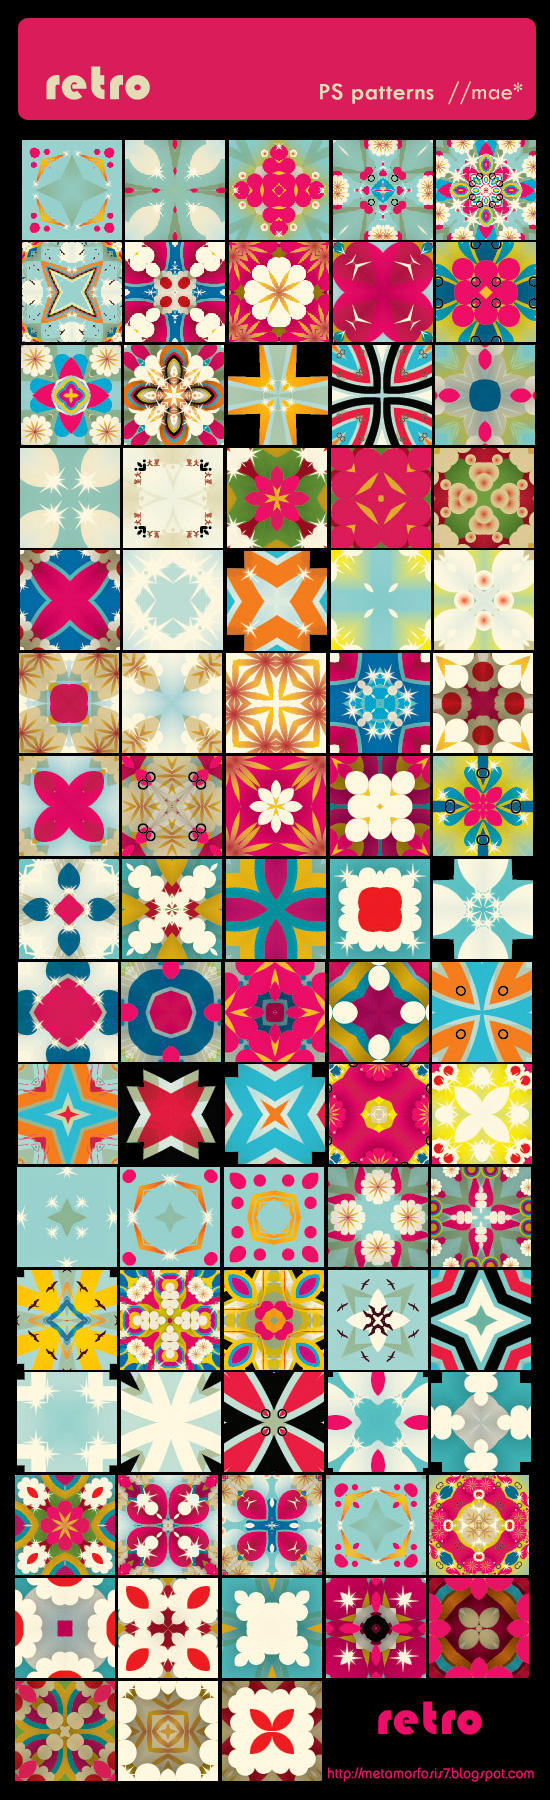 retro PS patterns by mae-b